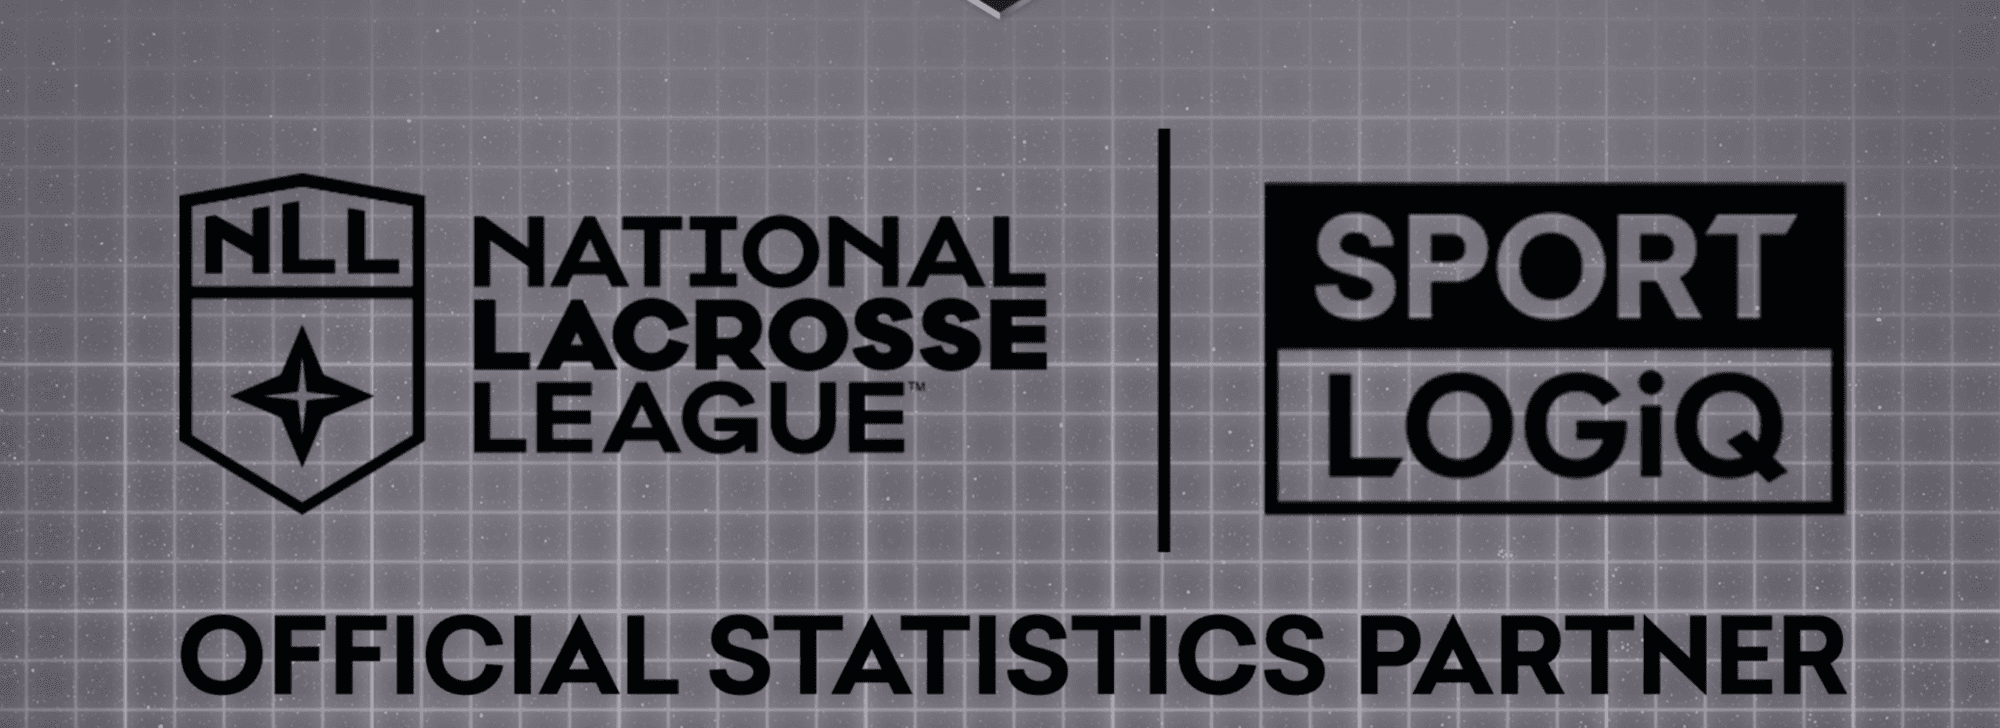 nll national lacrosse league sportslogiq